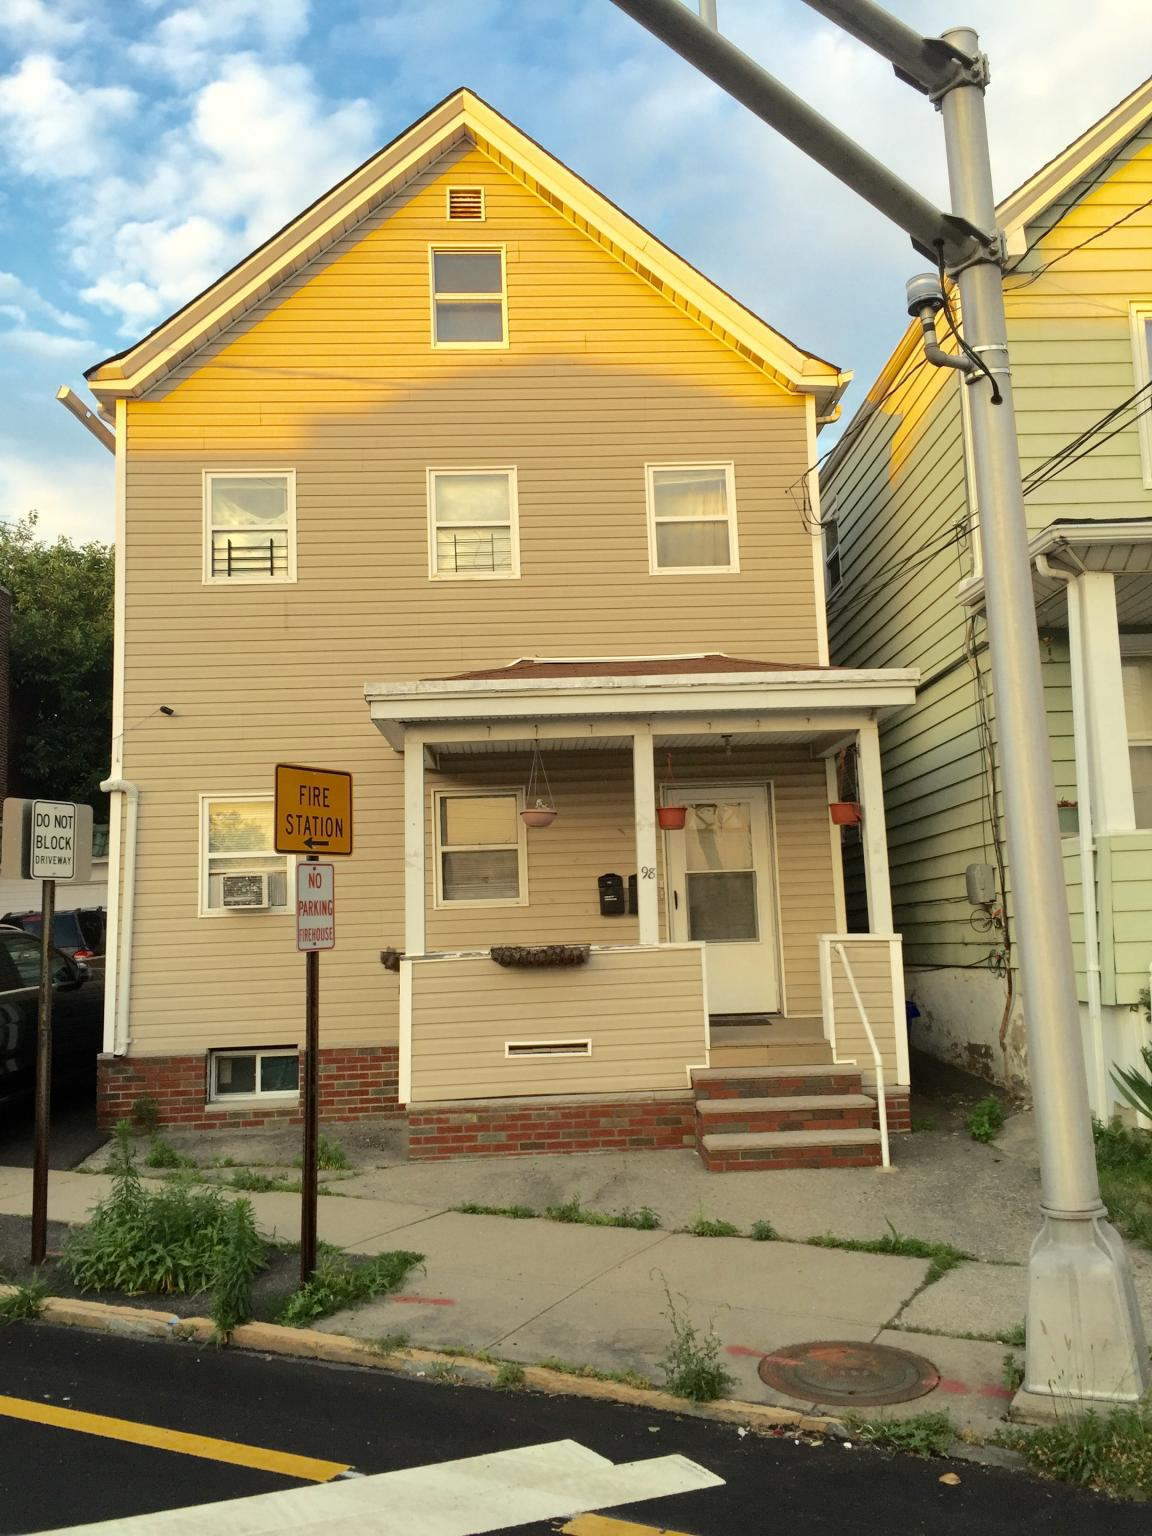 98 Midland Ave Garfield Nj Single Family Home 6 Photos Trulia